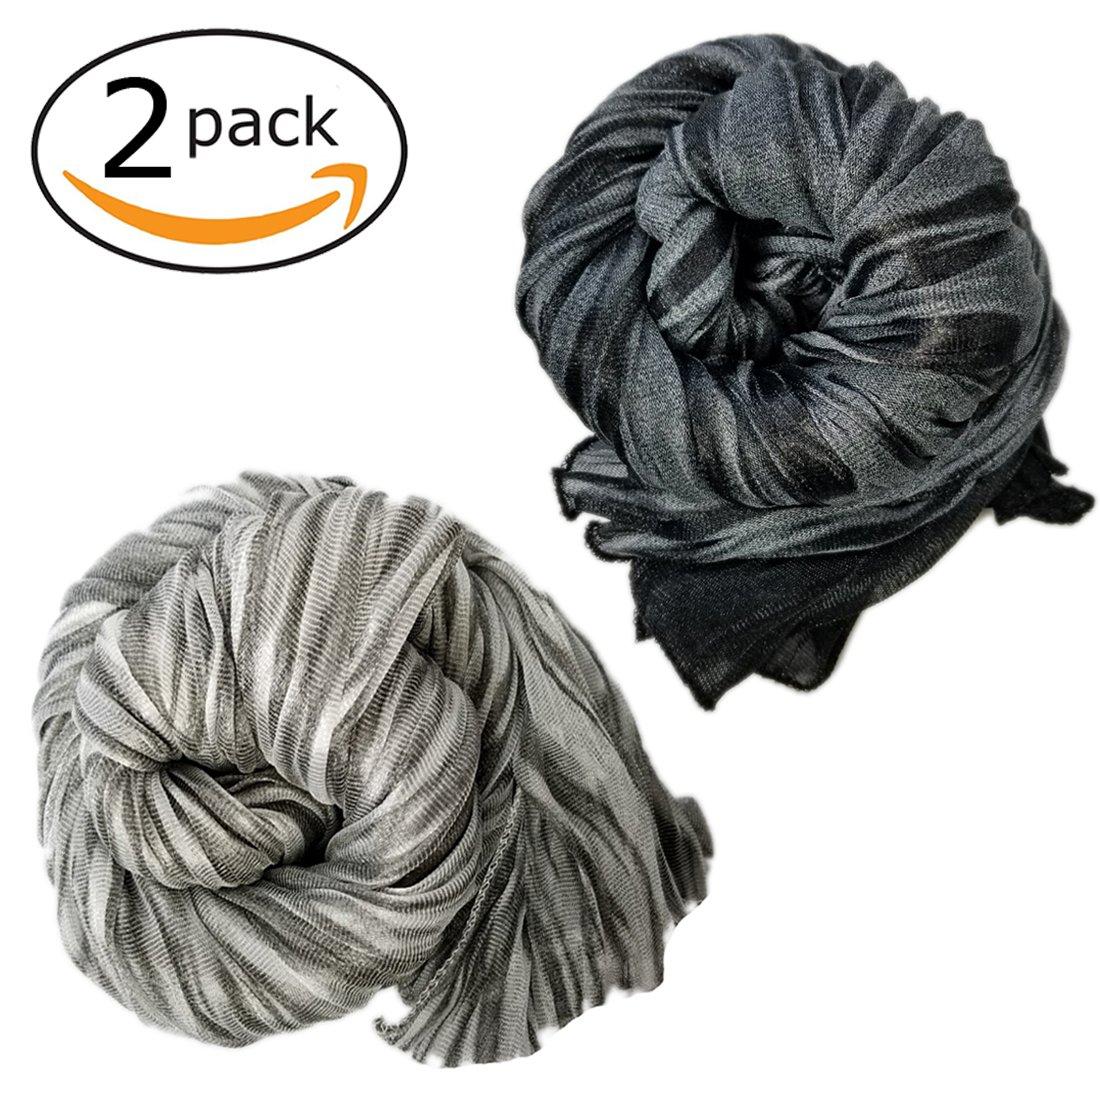 Stretch Head Wrap - Long Black Head Wrap Turban Hair Scarf Tie Color 1pcs (Tigerblackgrey)